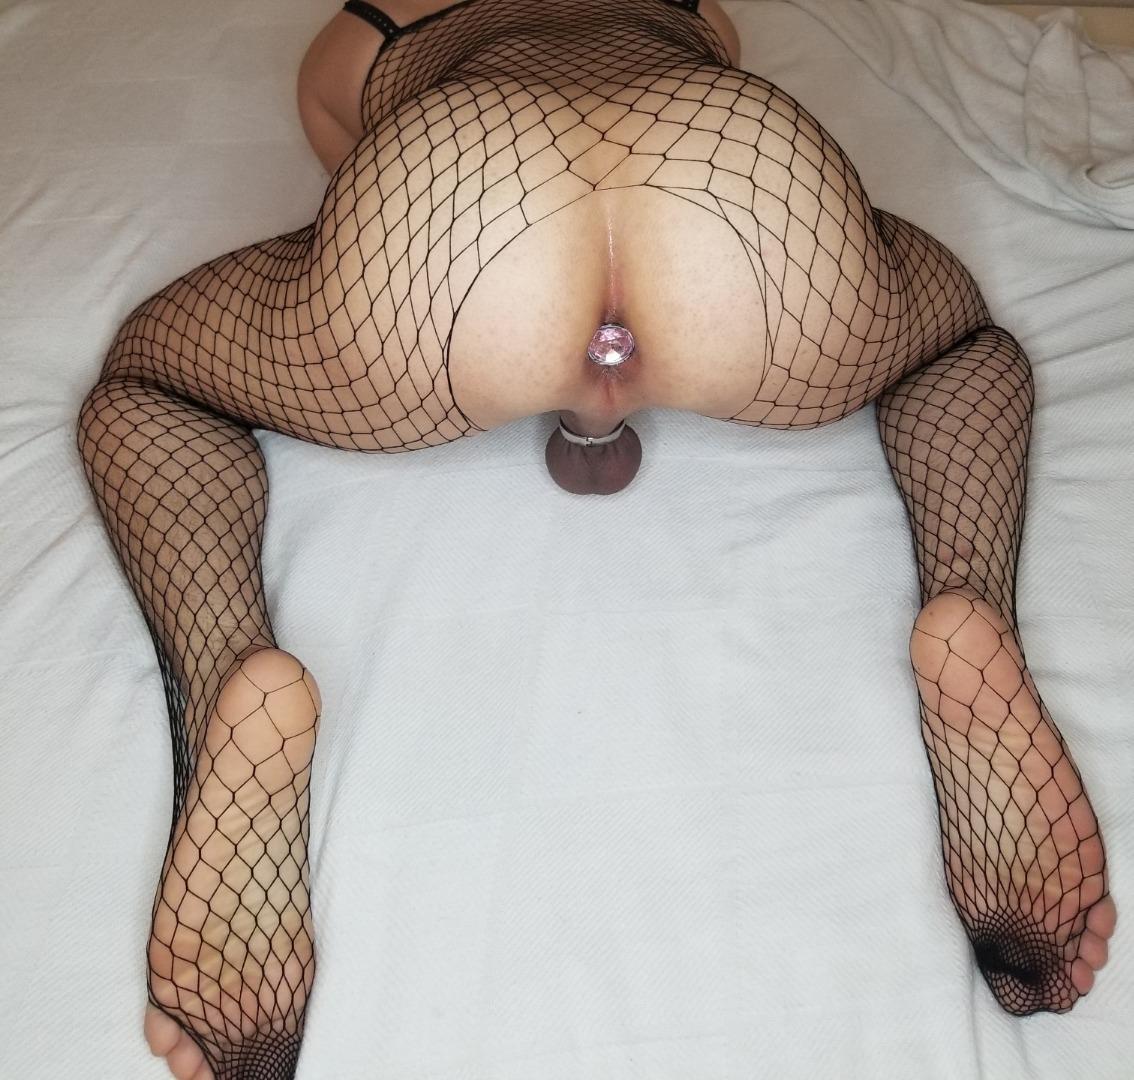 asian anal webcam omegle skype pornhub free watch